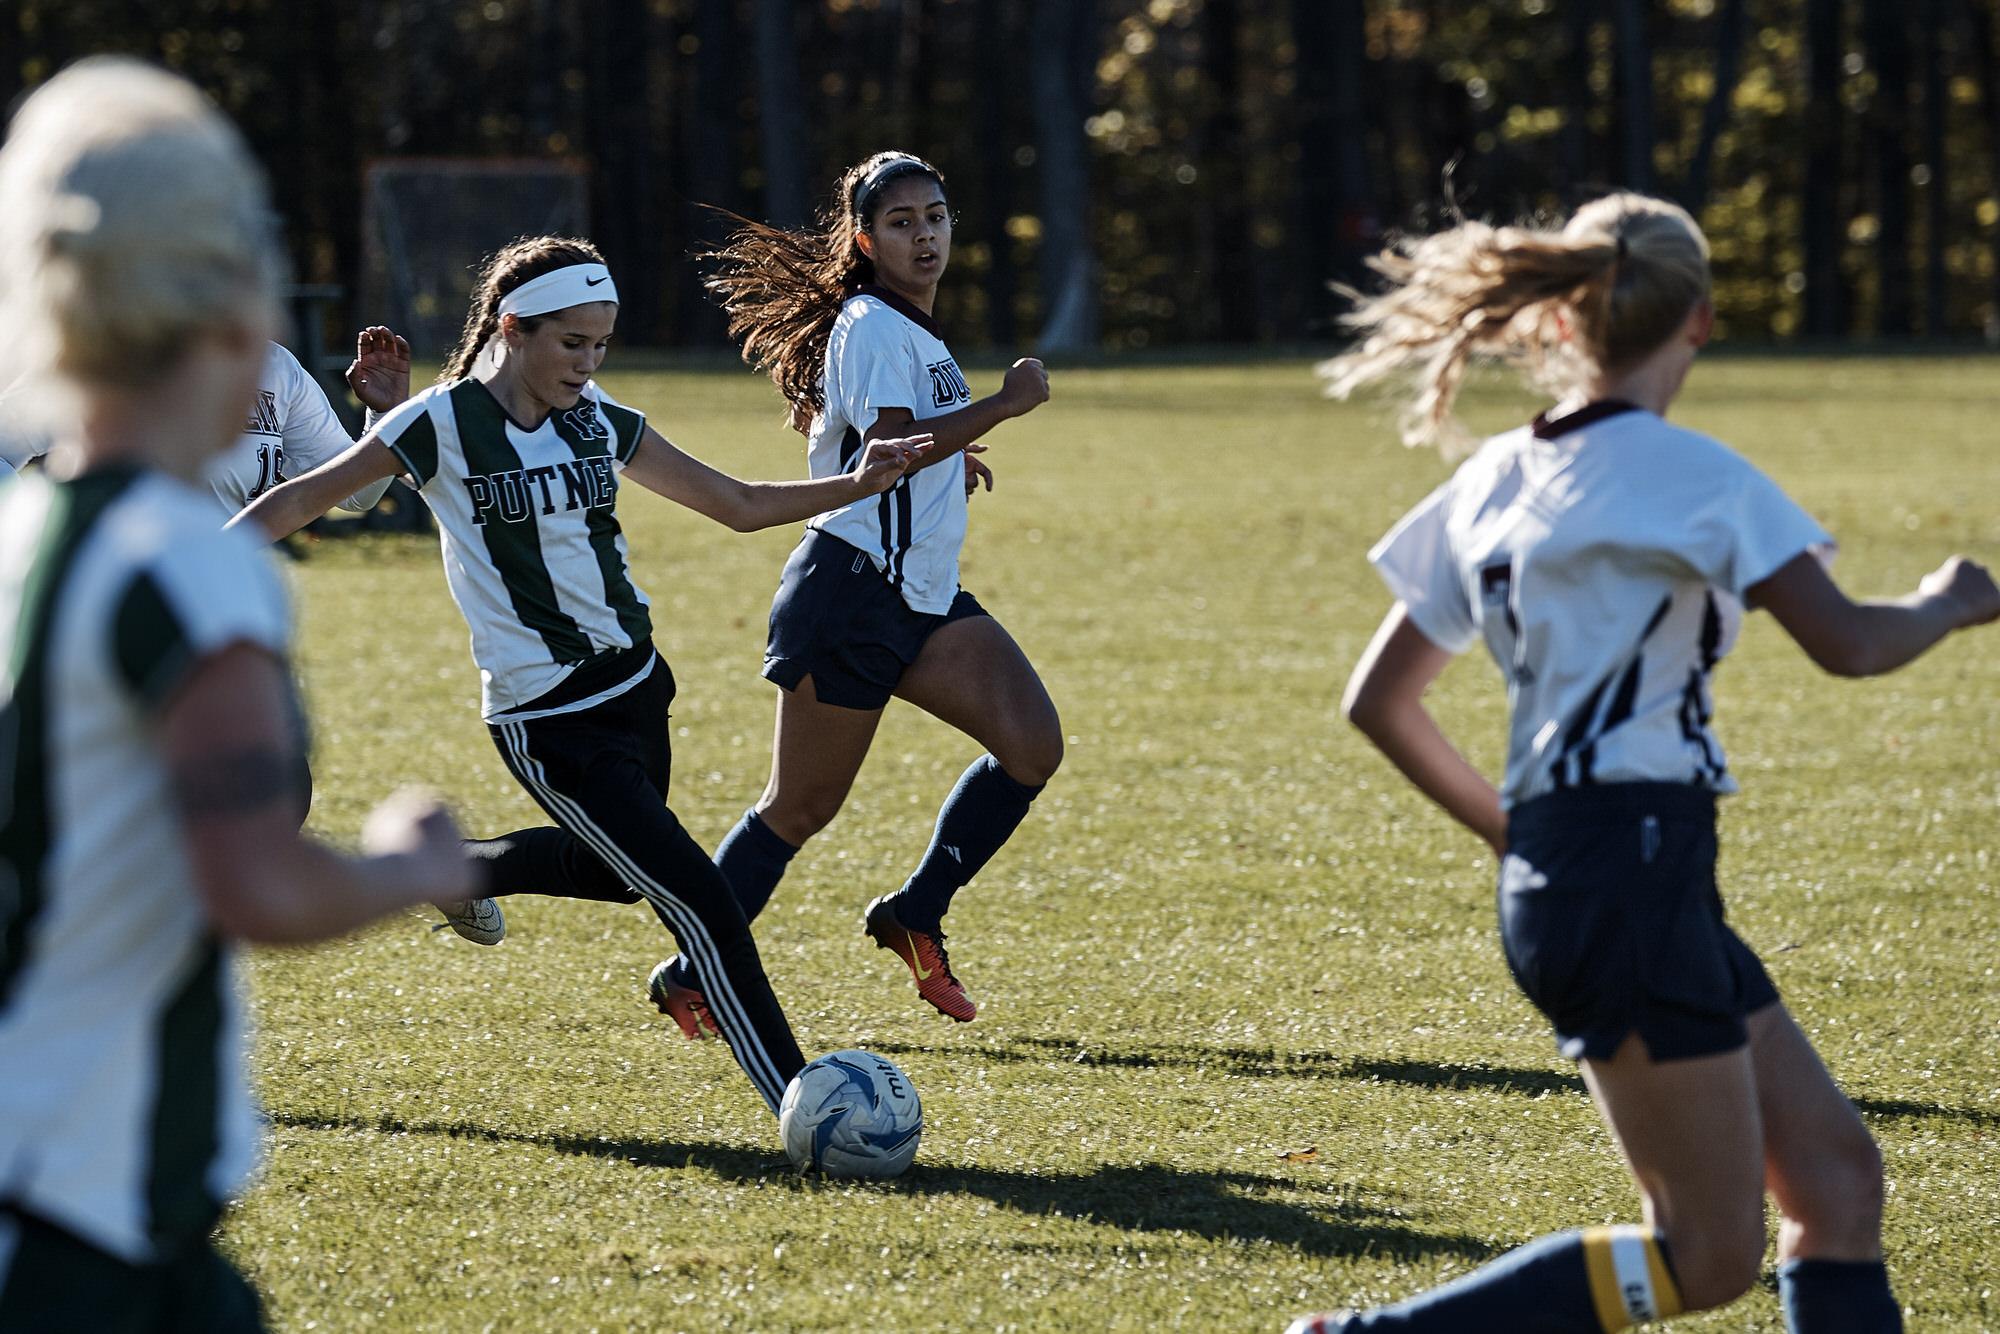 Girls Varsity Soccer vs. Putney School - October 26, 2018 - 013.jpg